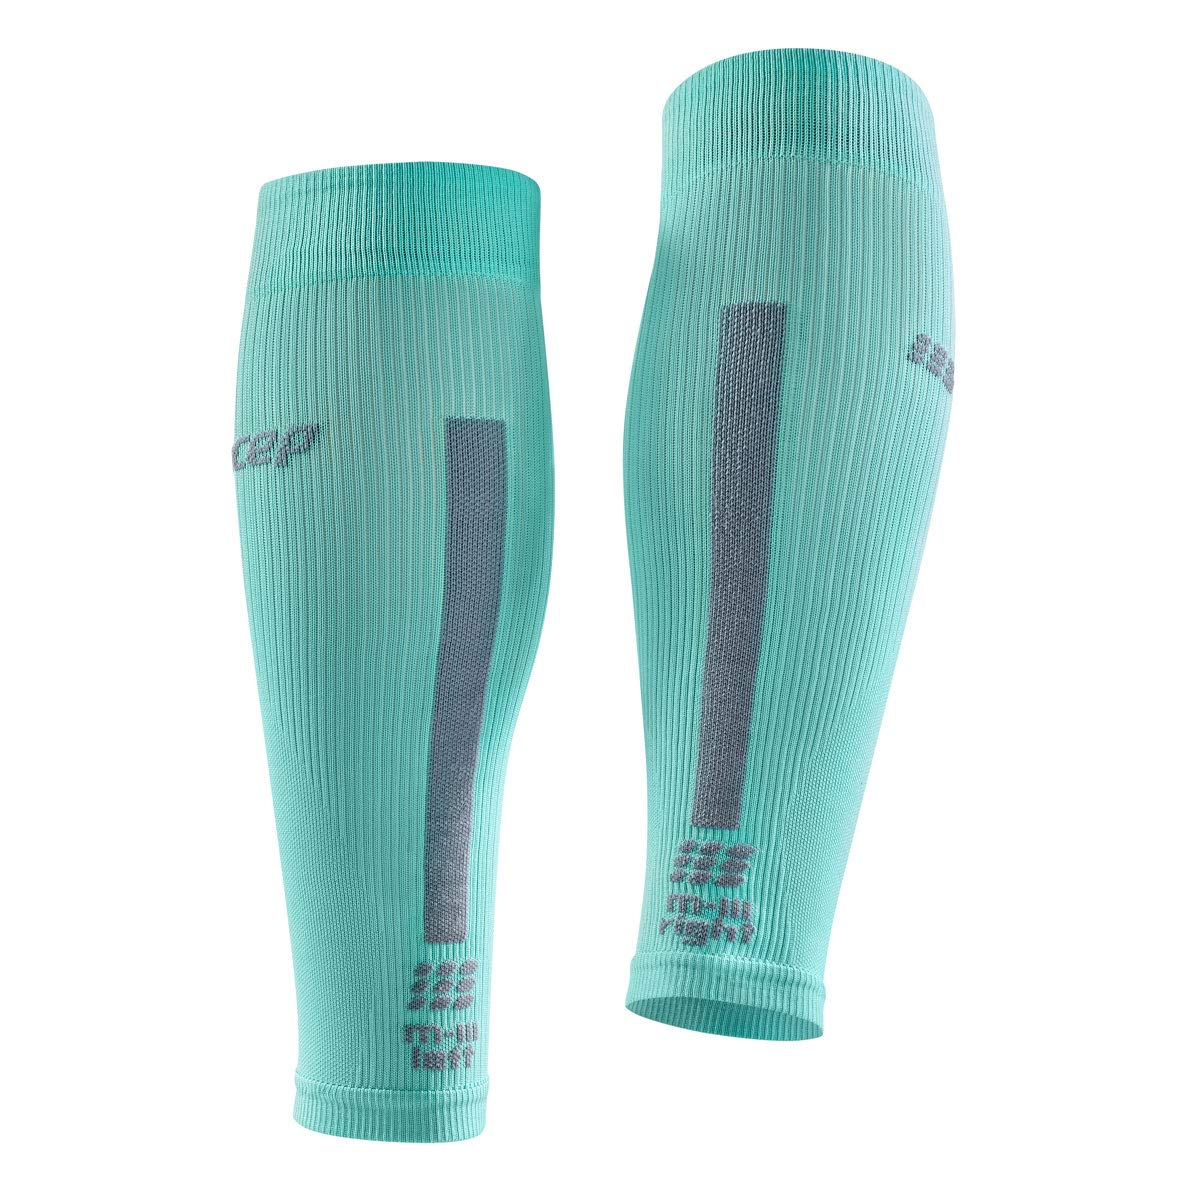 Cep Calf Sleeves 3.0 Femmes Kompressionscalves Turquoise